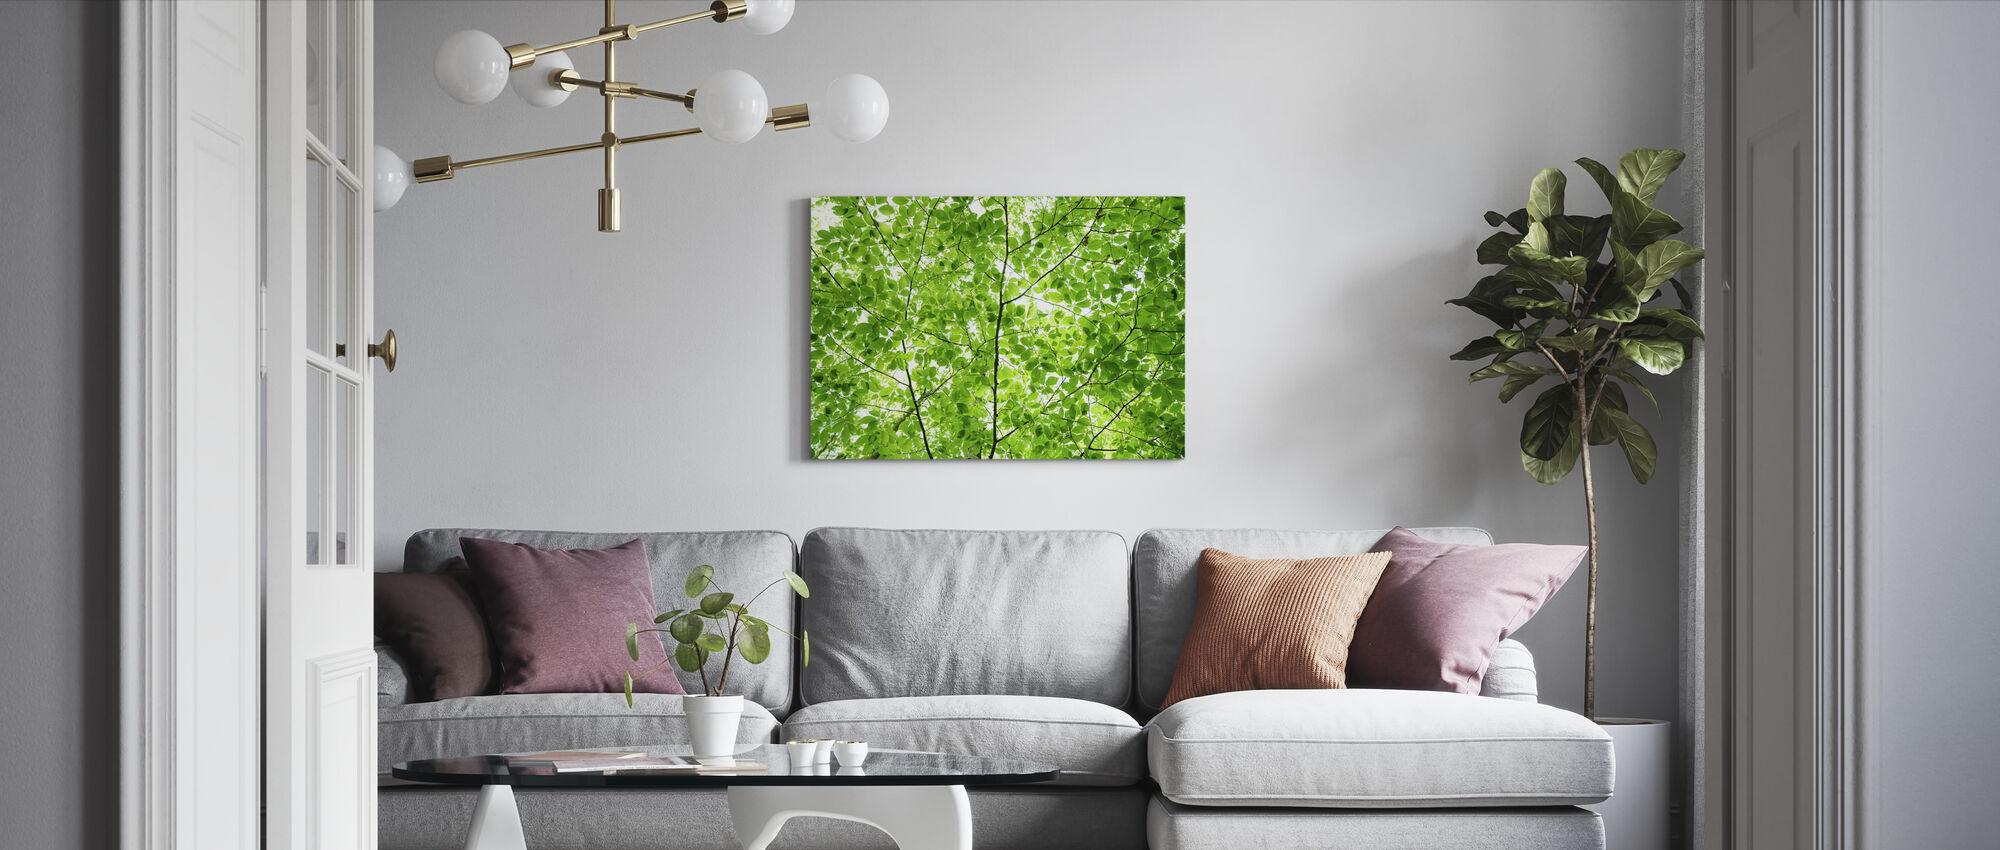 Wall of Fresh Leaves - Canvas print - Living Room